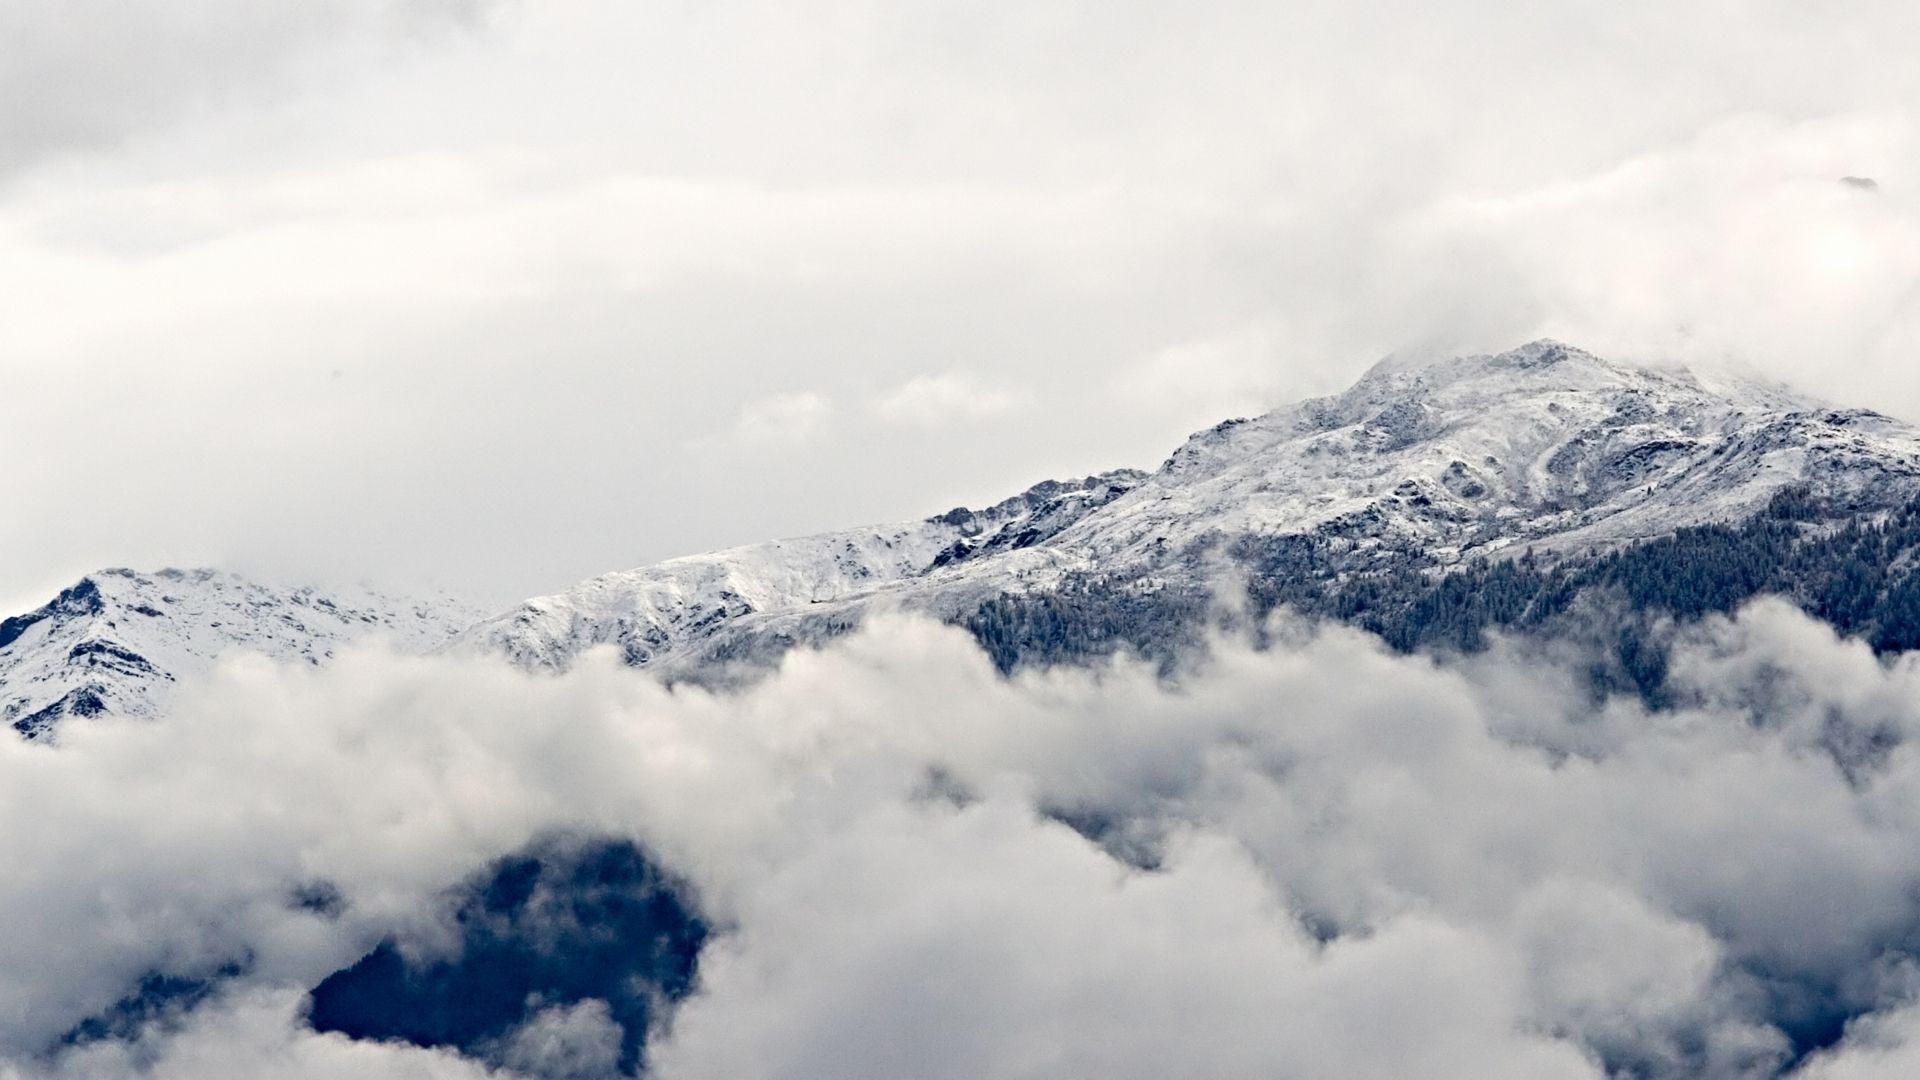 Good Wallpaper Mountain Hipster - 2c127c9c568d57ebdd3f377432446c66  Photograph_201210.jpg